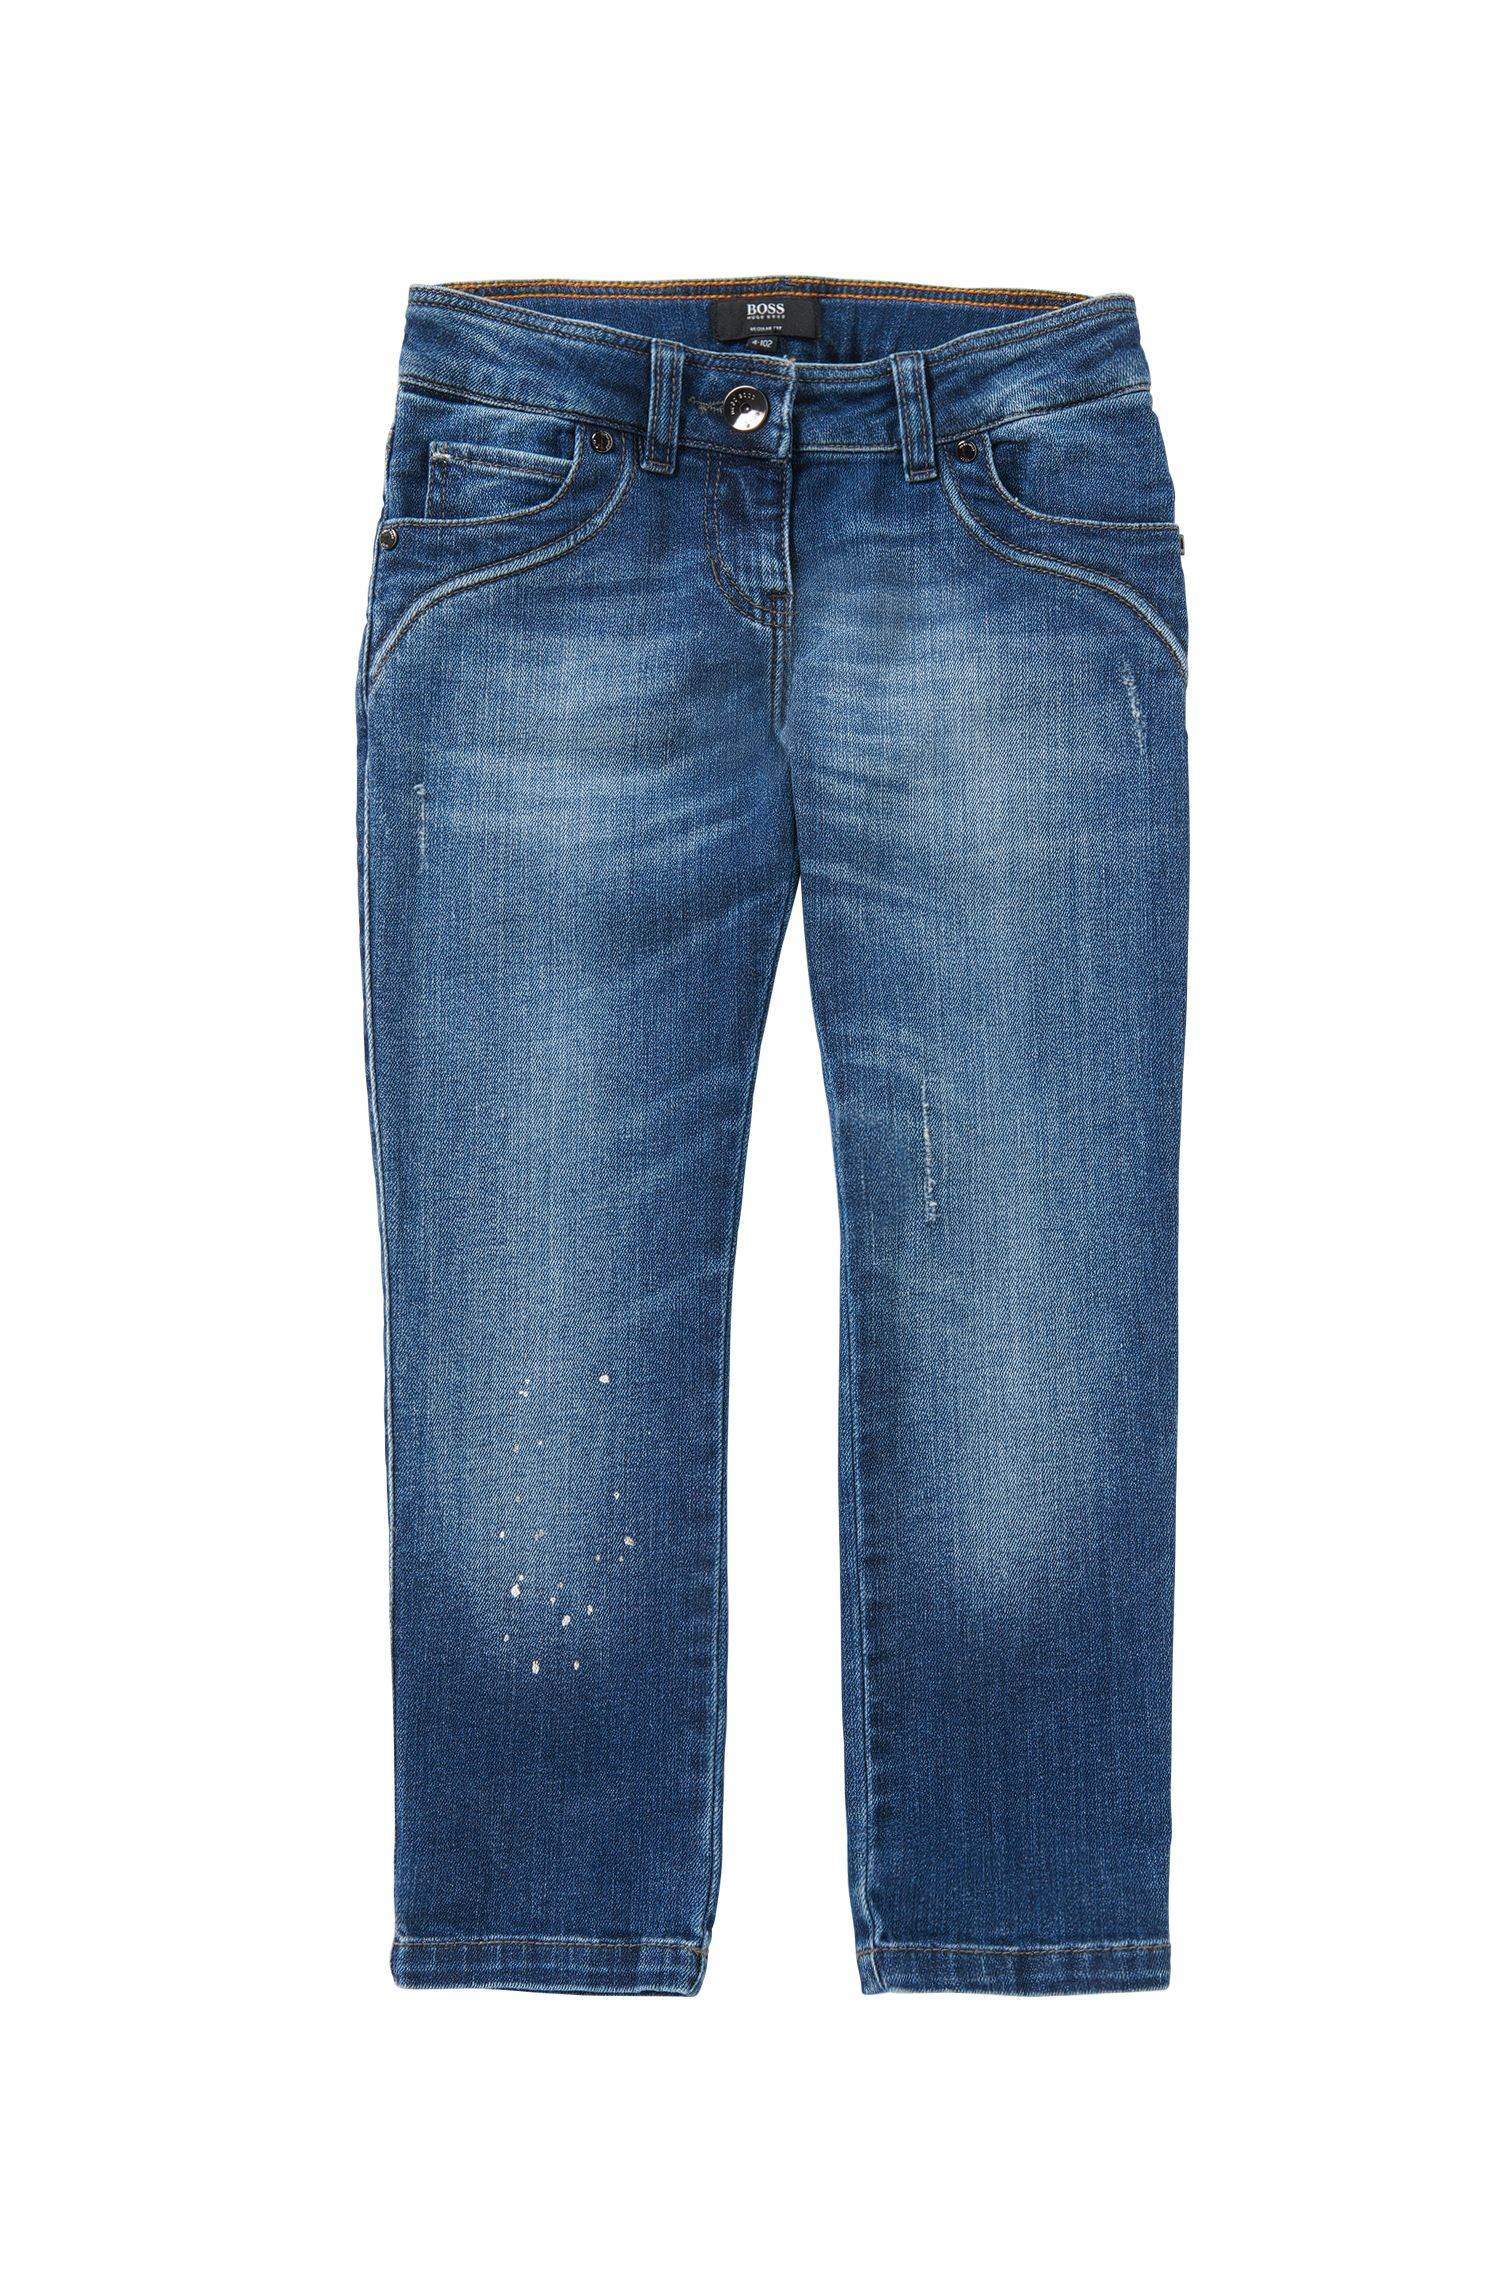 'J14181' | Girls Stretch Cotton Blend Jeans